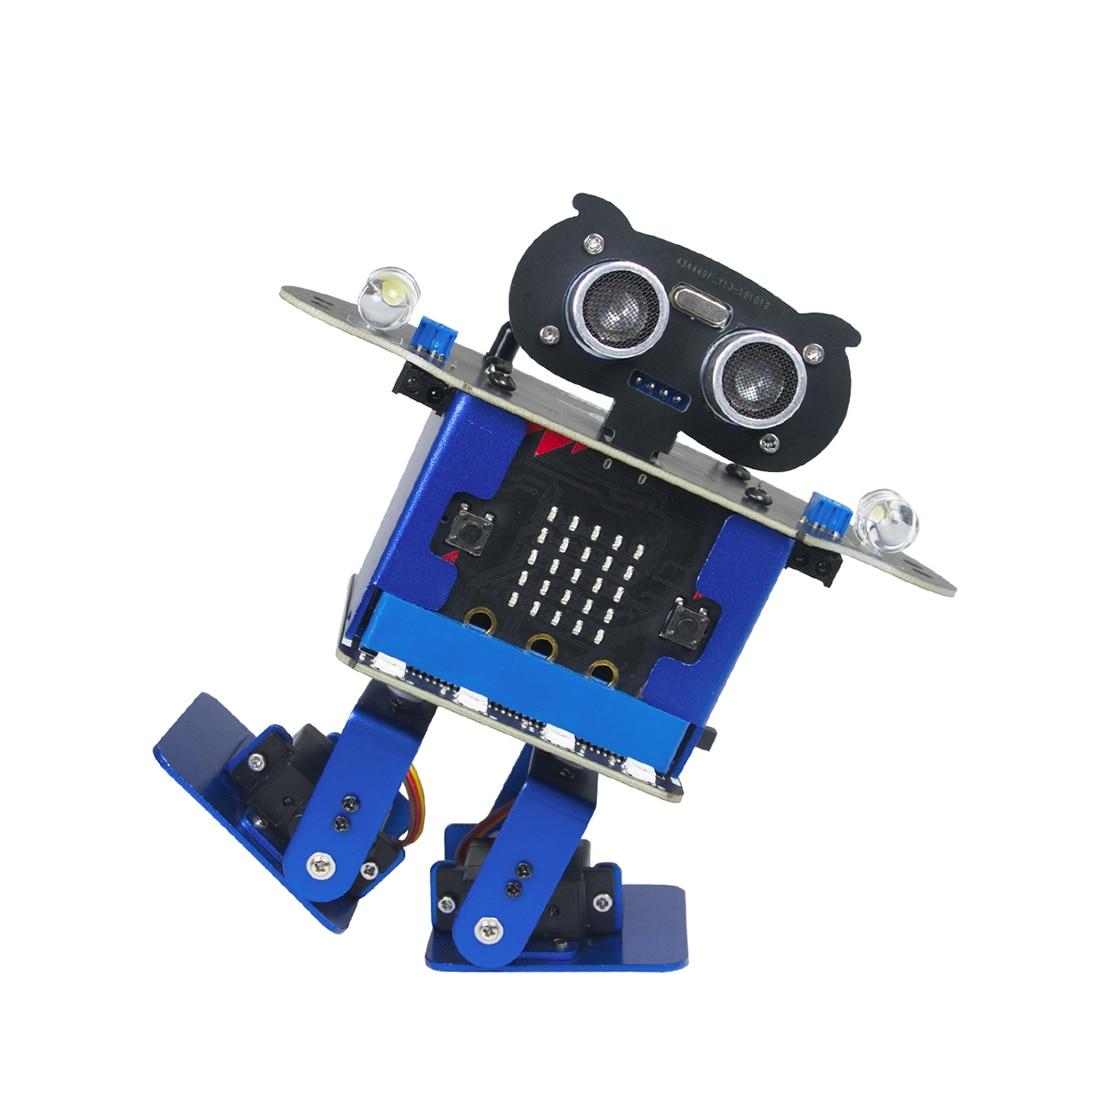 Programmable Dancing Robot Bipedal Humanoid Microbit Robot DIY Programming Starter Kit For Microbit